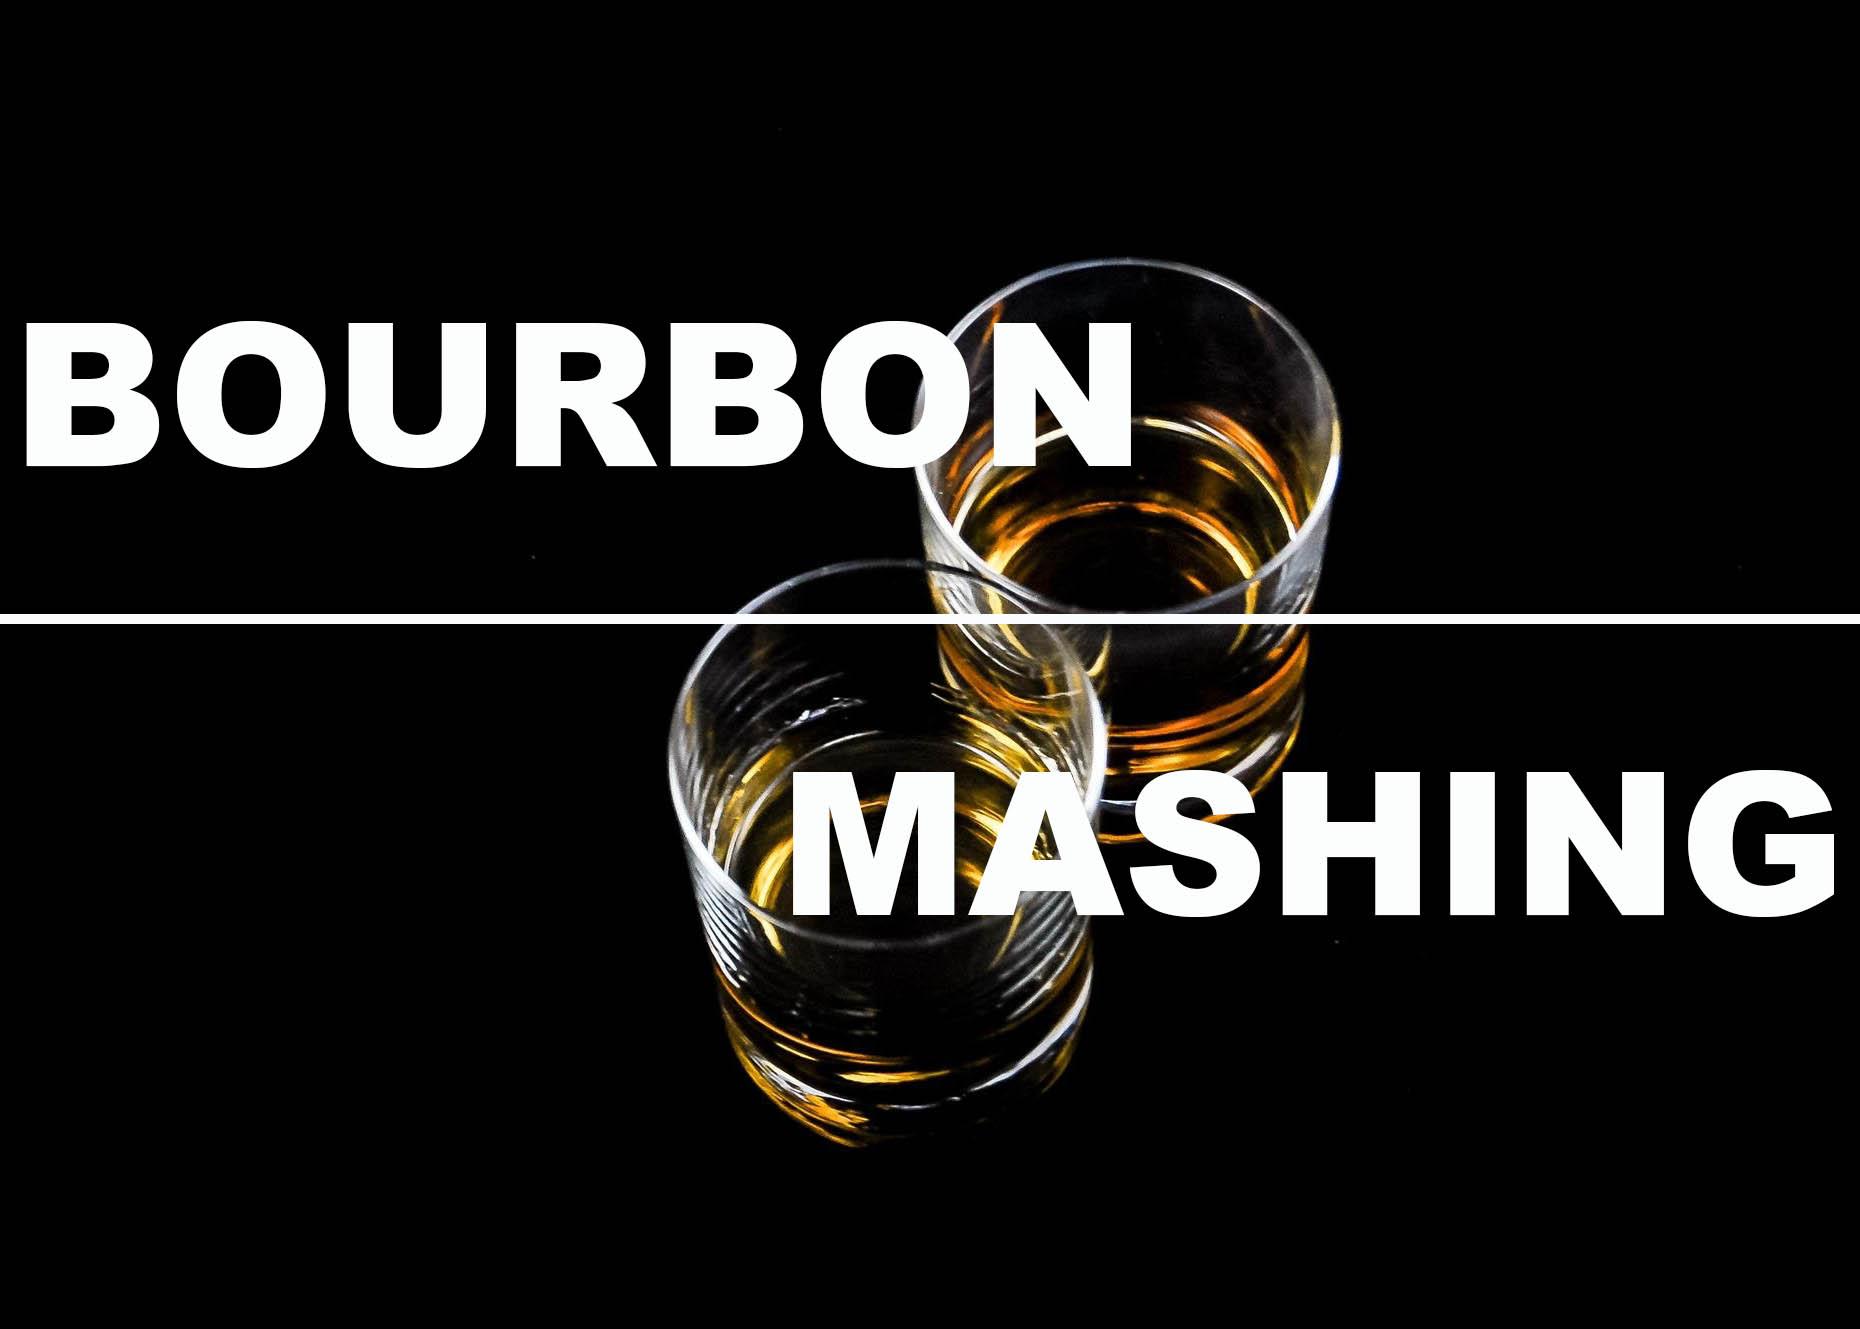 Ep 6 – Bourbon Mashing